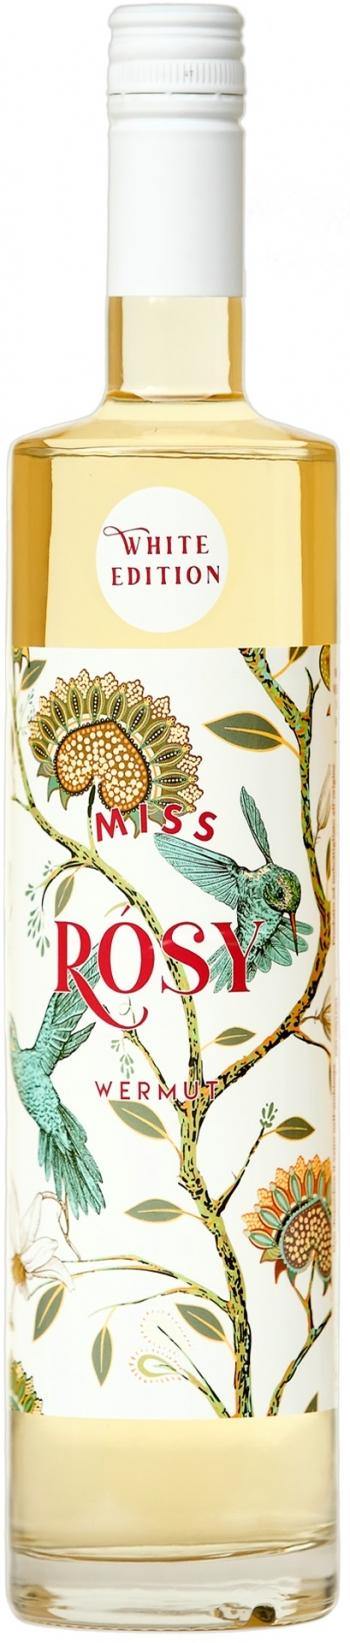 Miss Rosy Wermut Weiss, Strohmaier